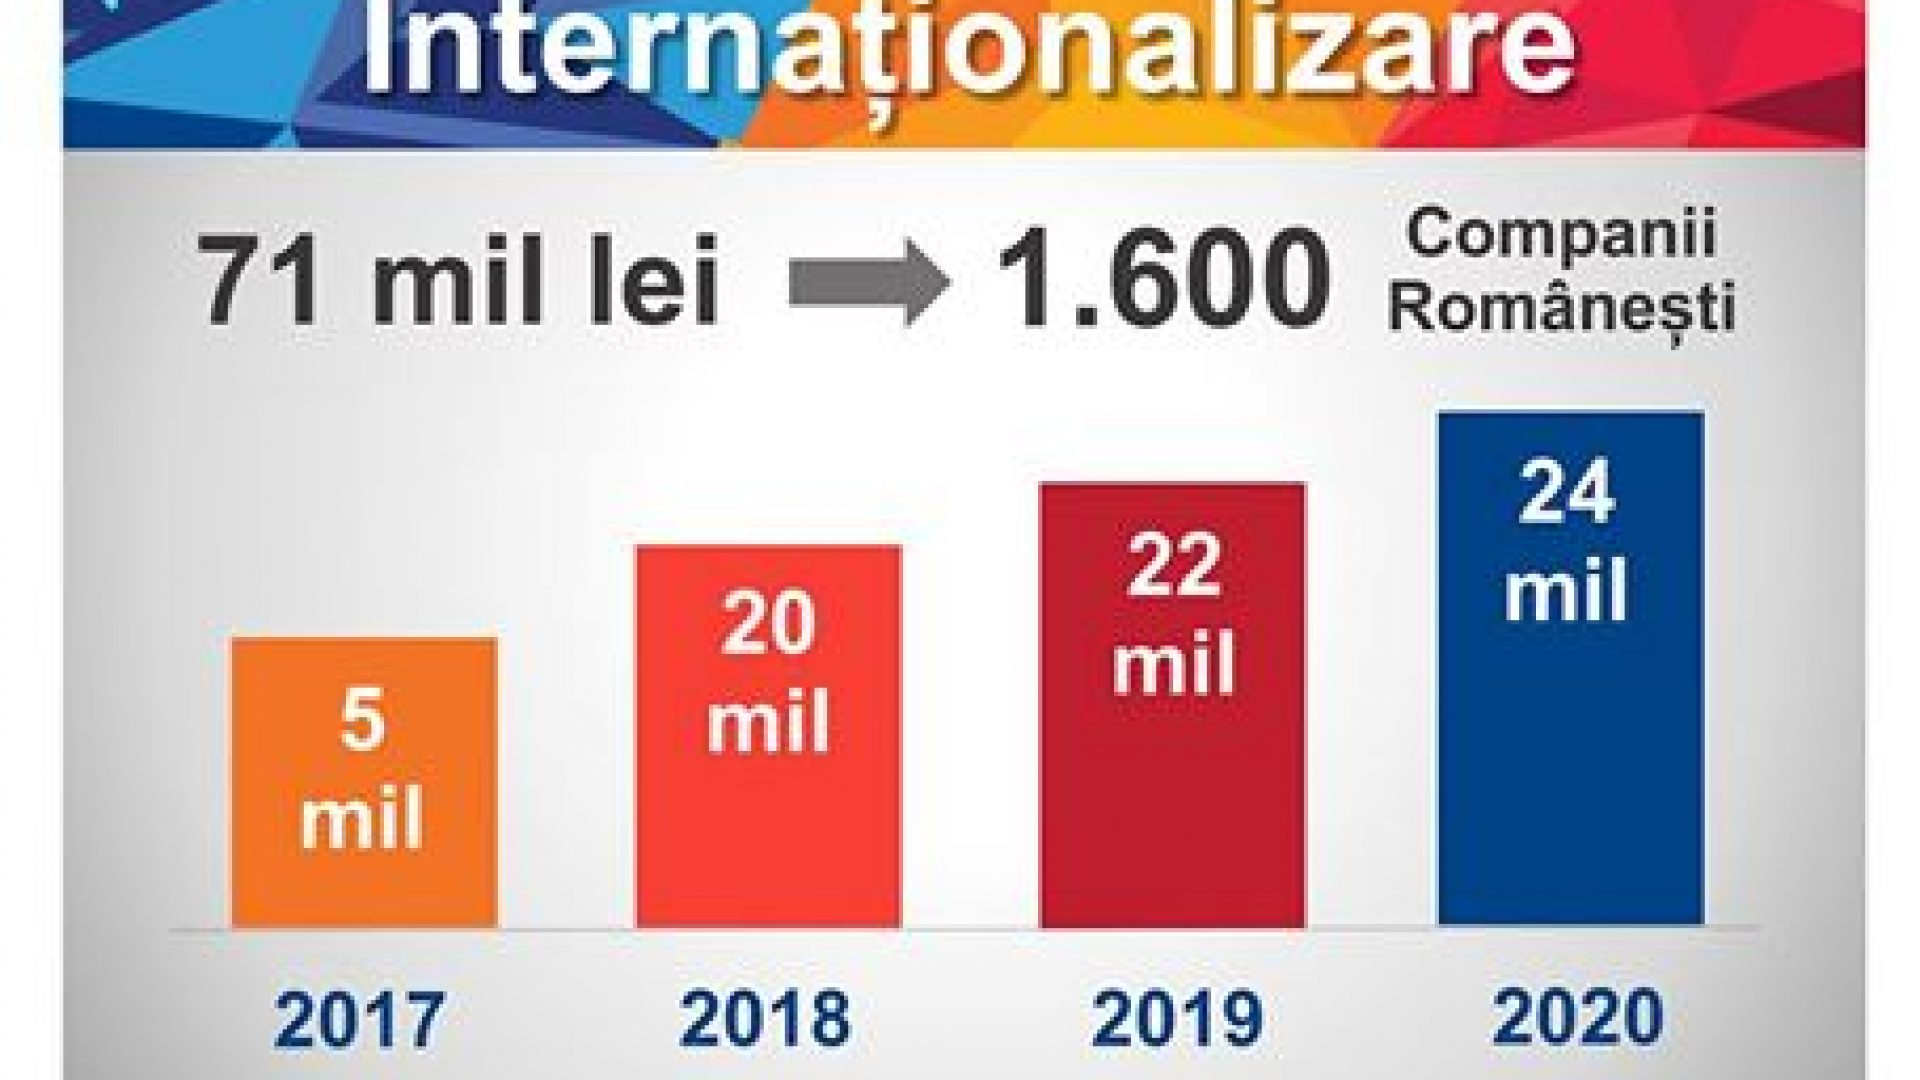 internationalizare